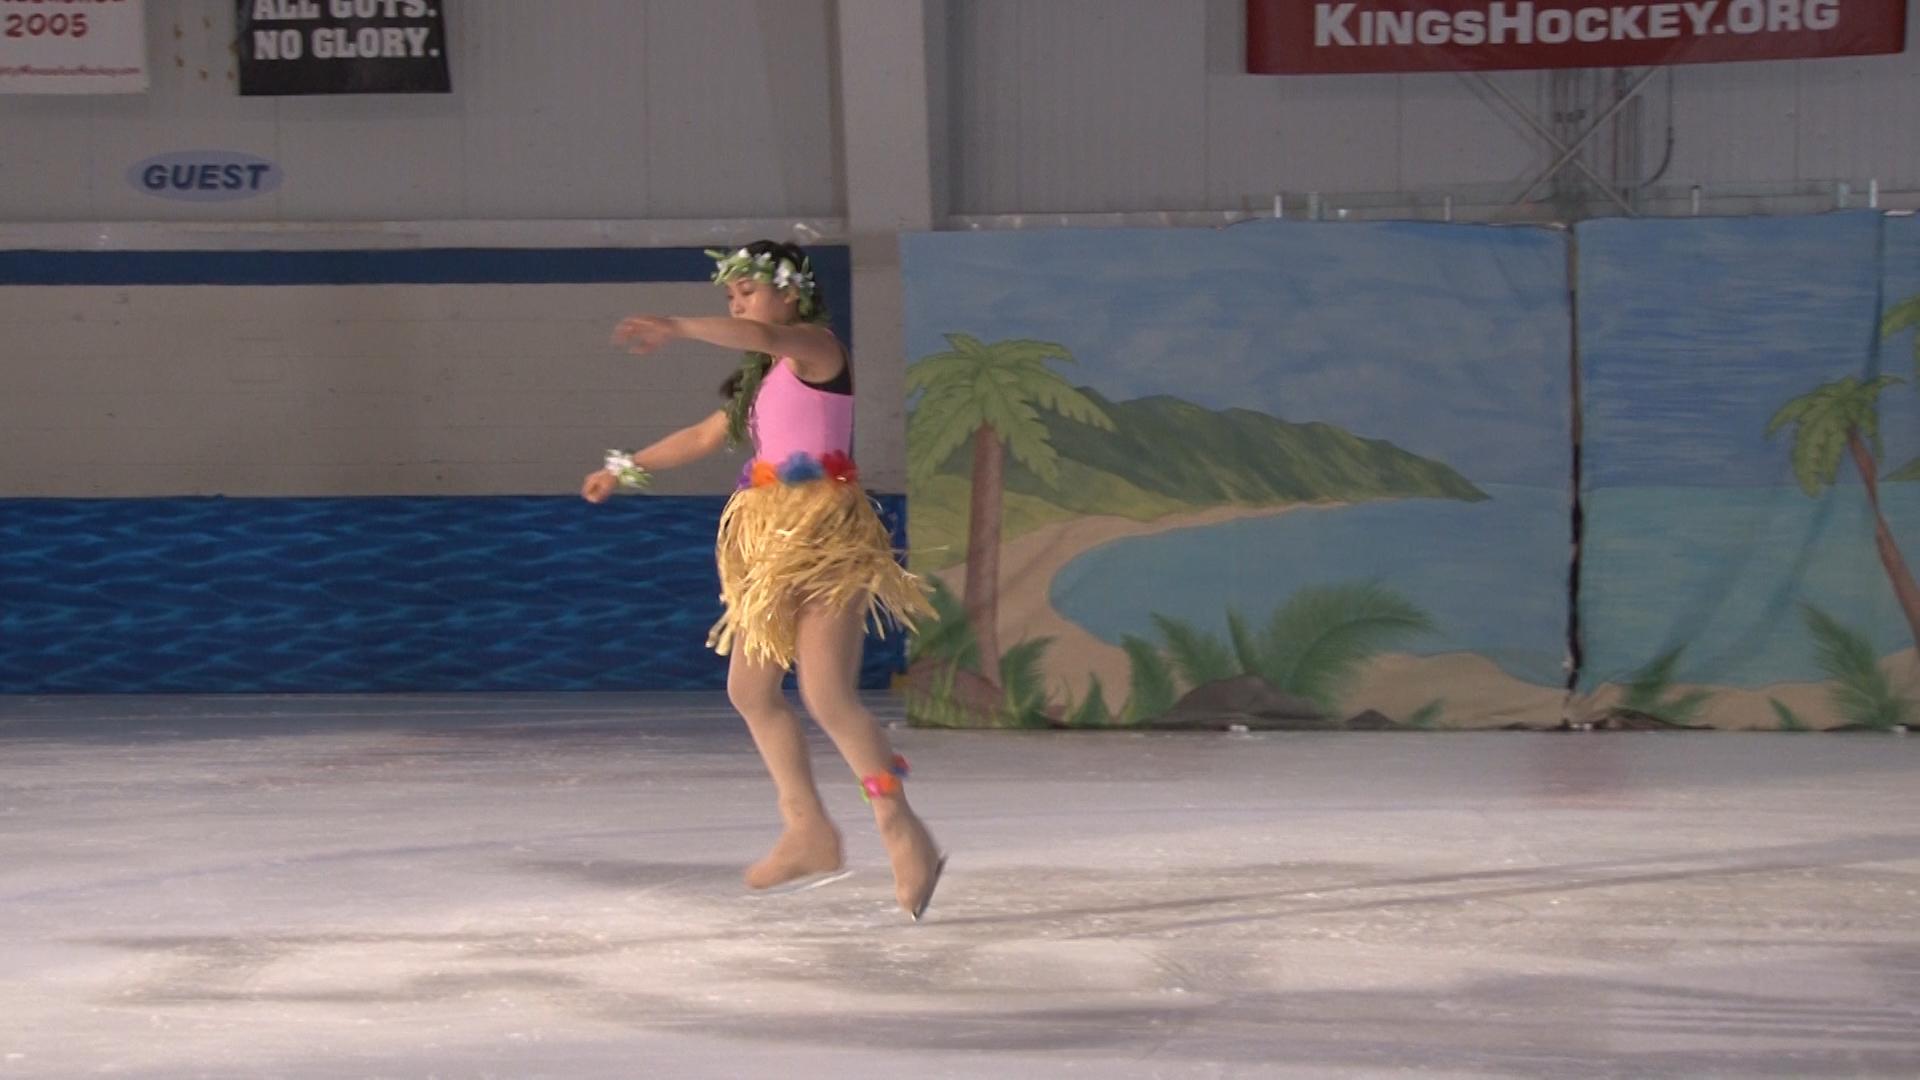 Power Play Maui Skate on Ice 071417.00_16_19_01.Still028.jpg